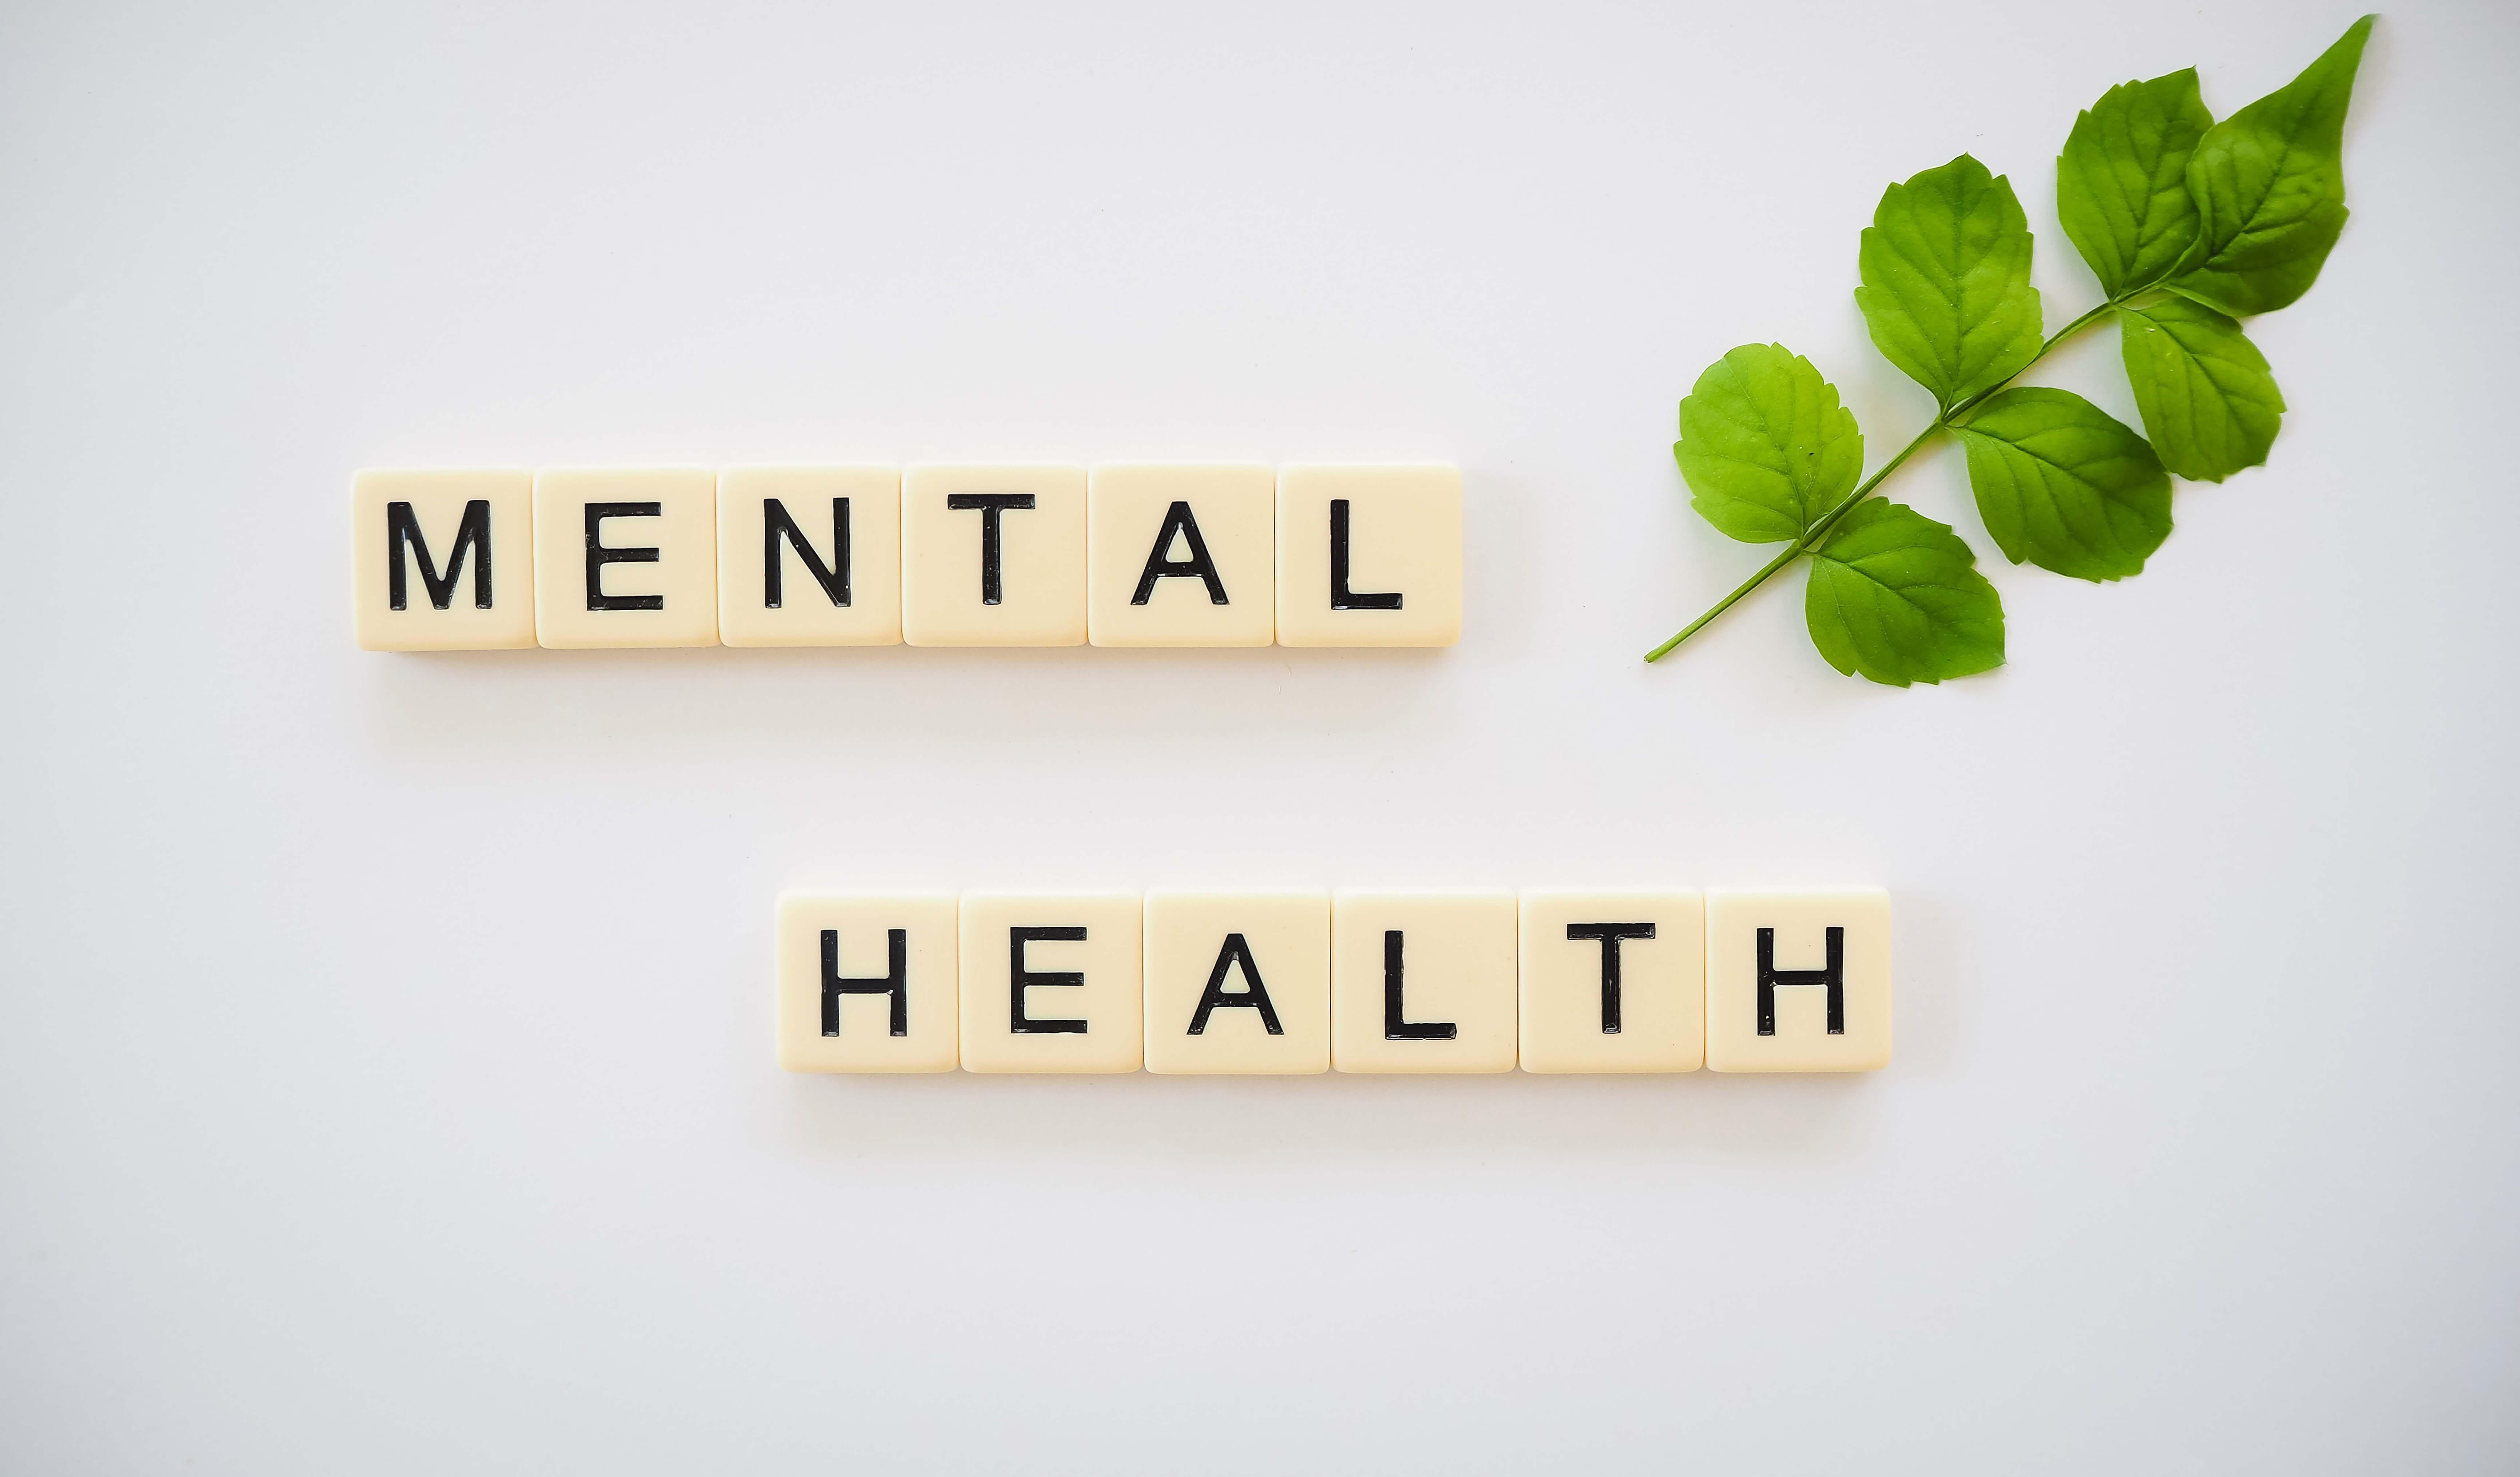 2 Psychology Postgraduates on Mental Health amidst COVID